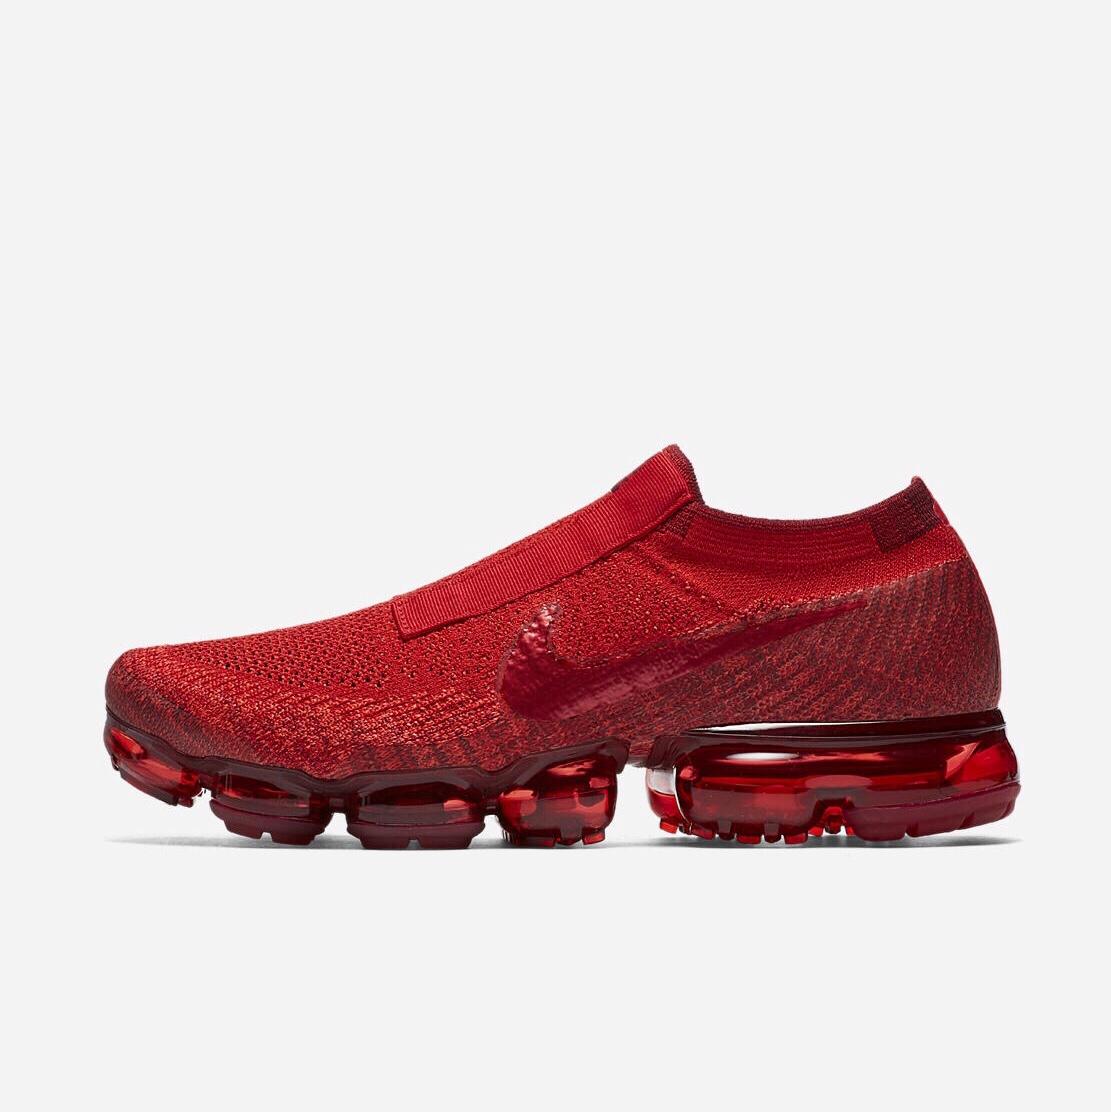 size 40 bf4d8 3ad0c Nike Air Vapormax SE Laceless